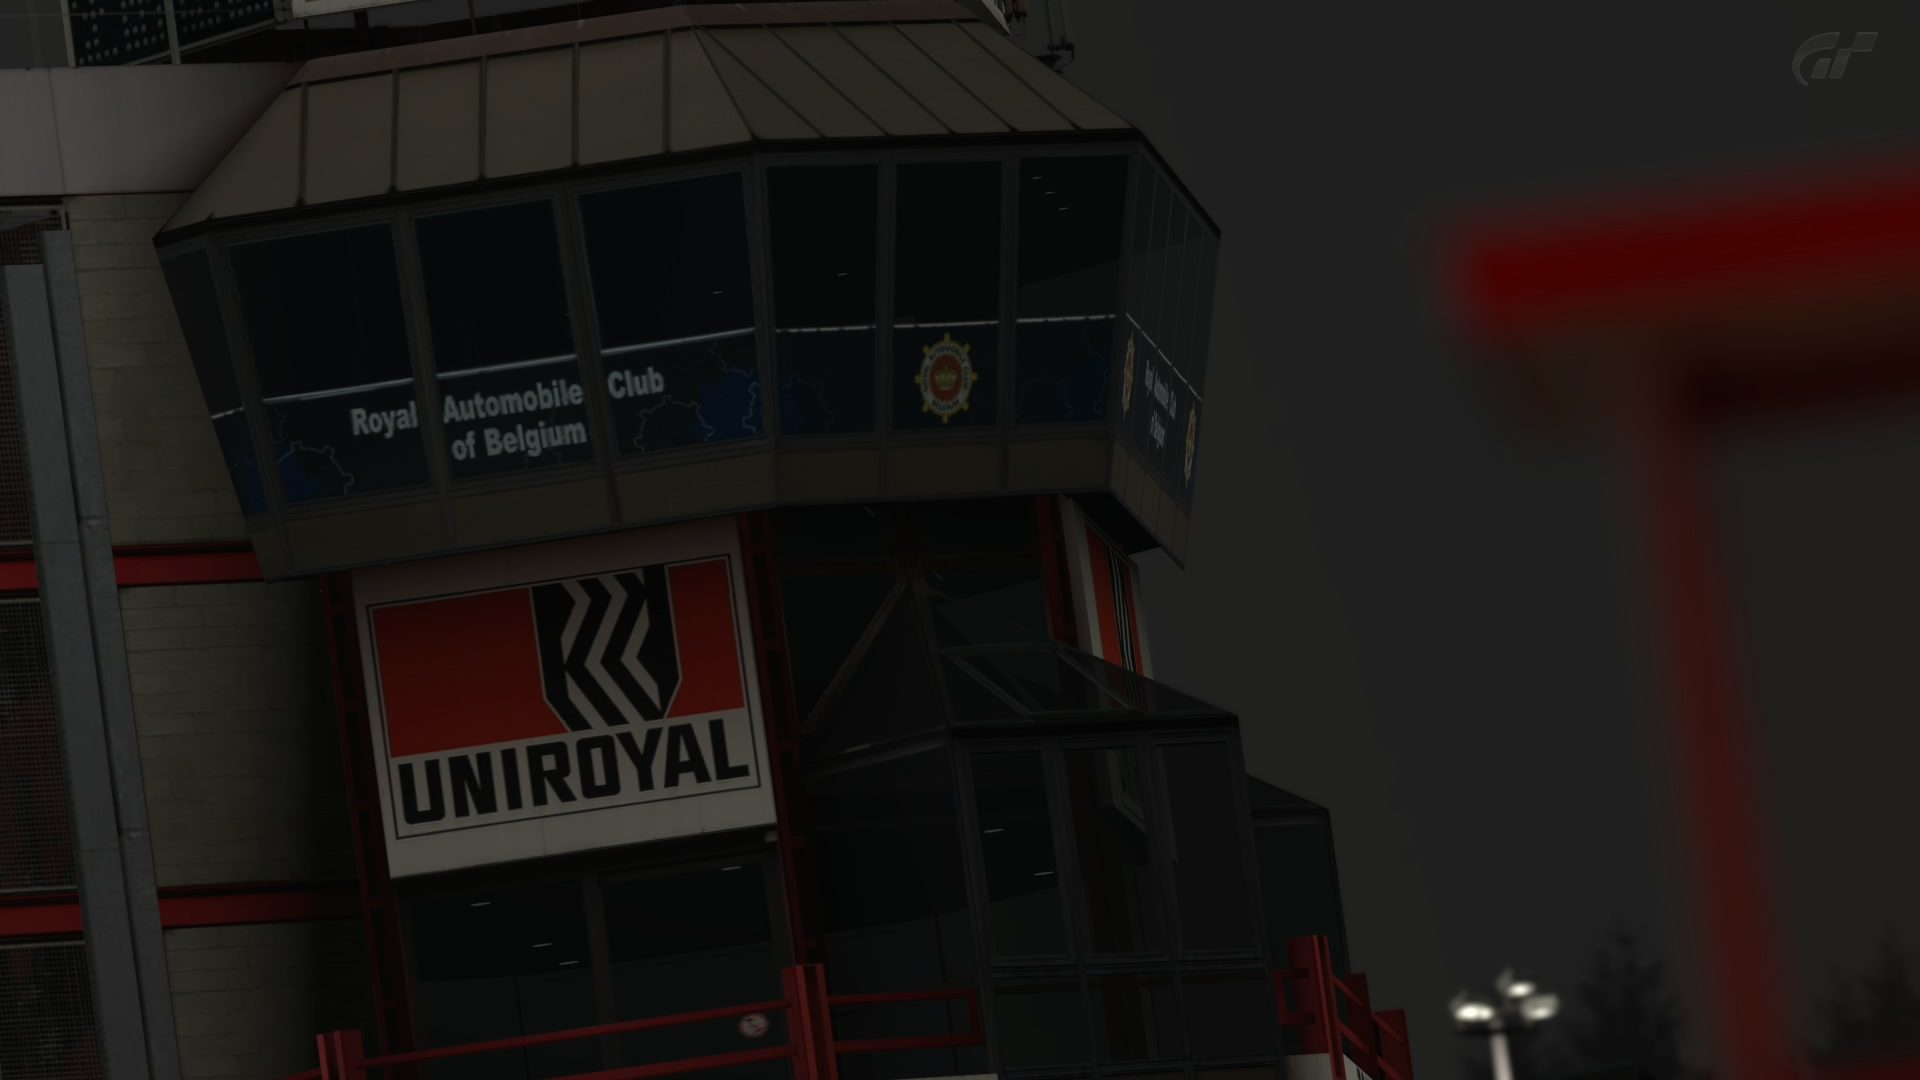 Circuit de Spa-Francorchamps_40.jpg